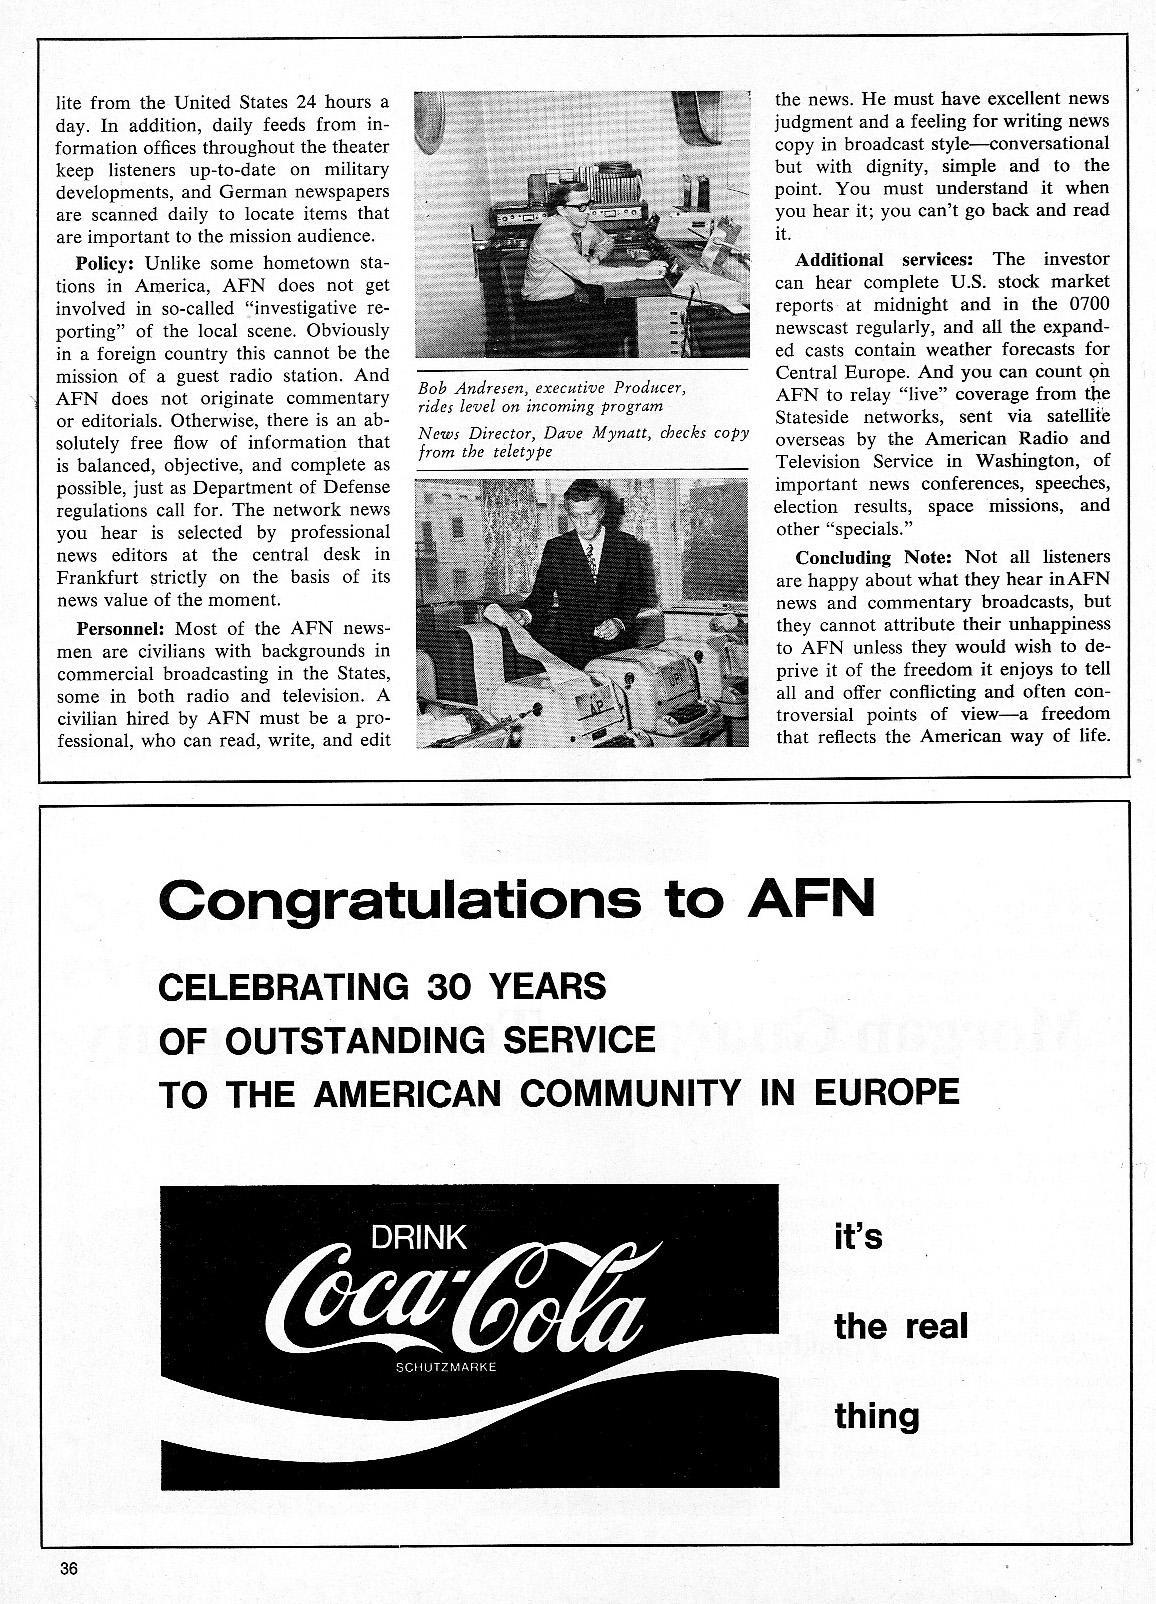 1973 AFN 30 jaar boekje-17.jpg